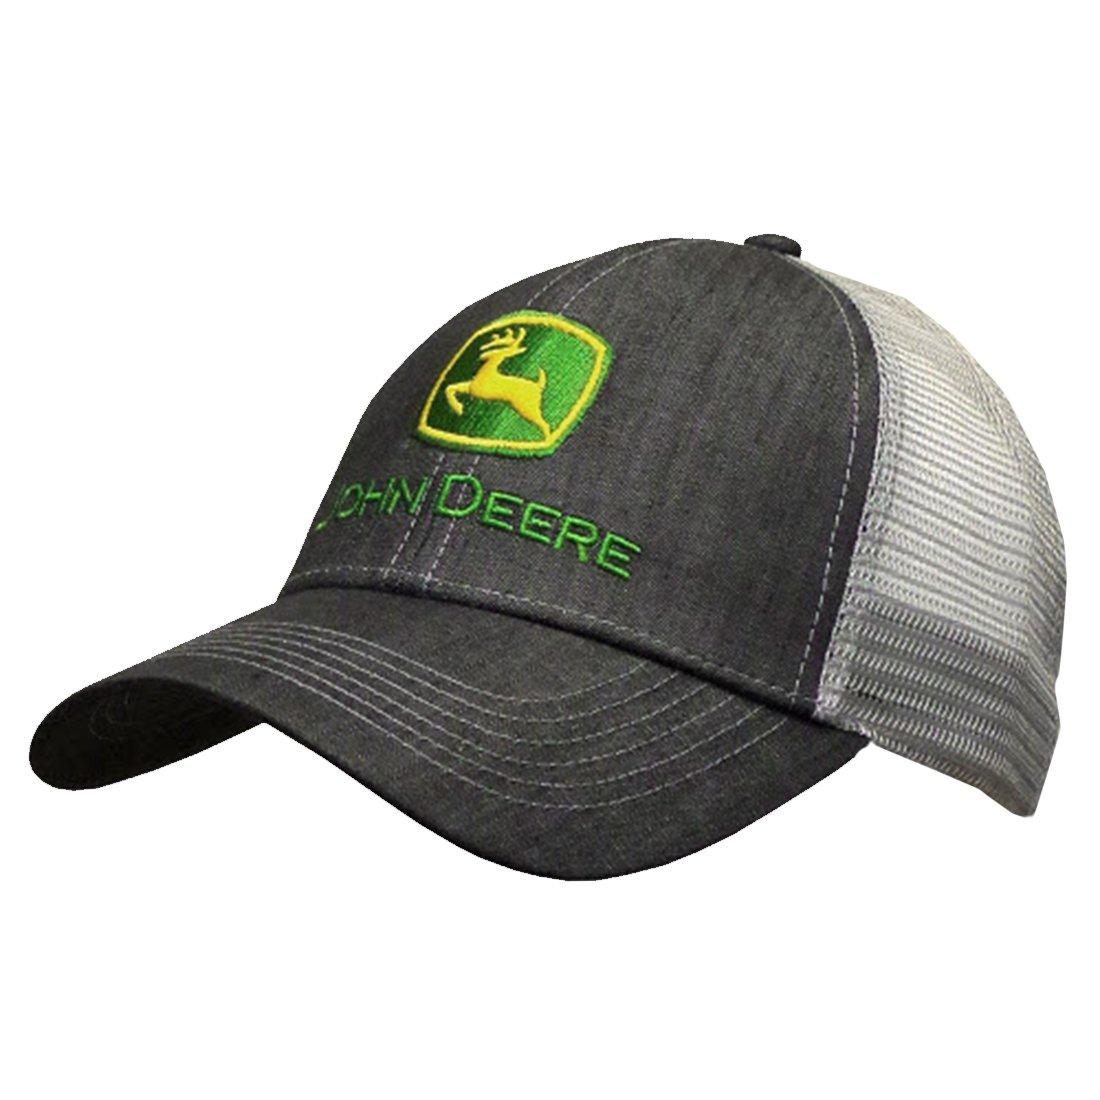 John Deere Dark Denim Style Mesh Back Hat